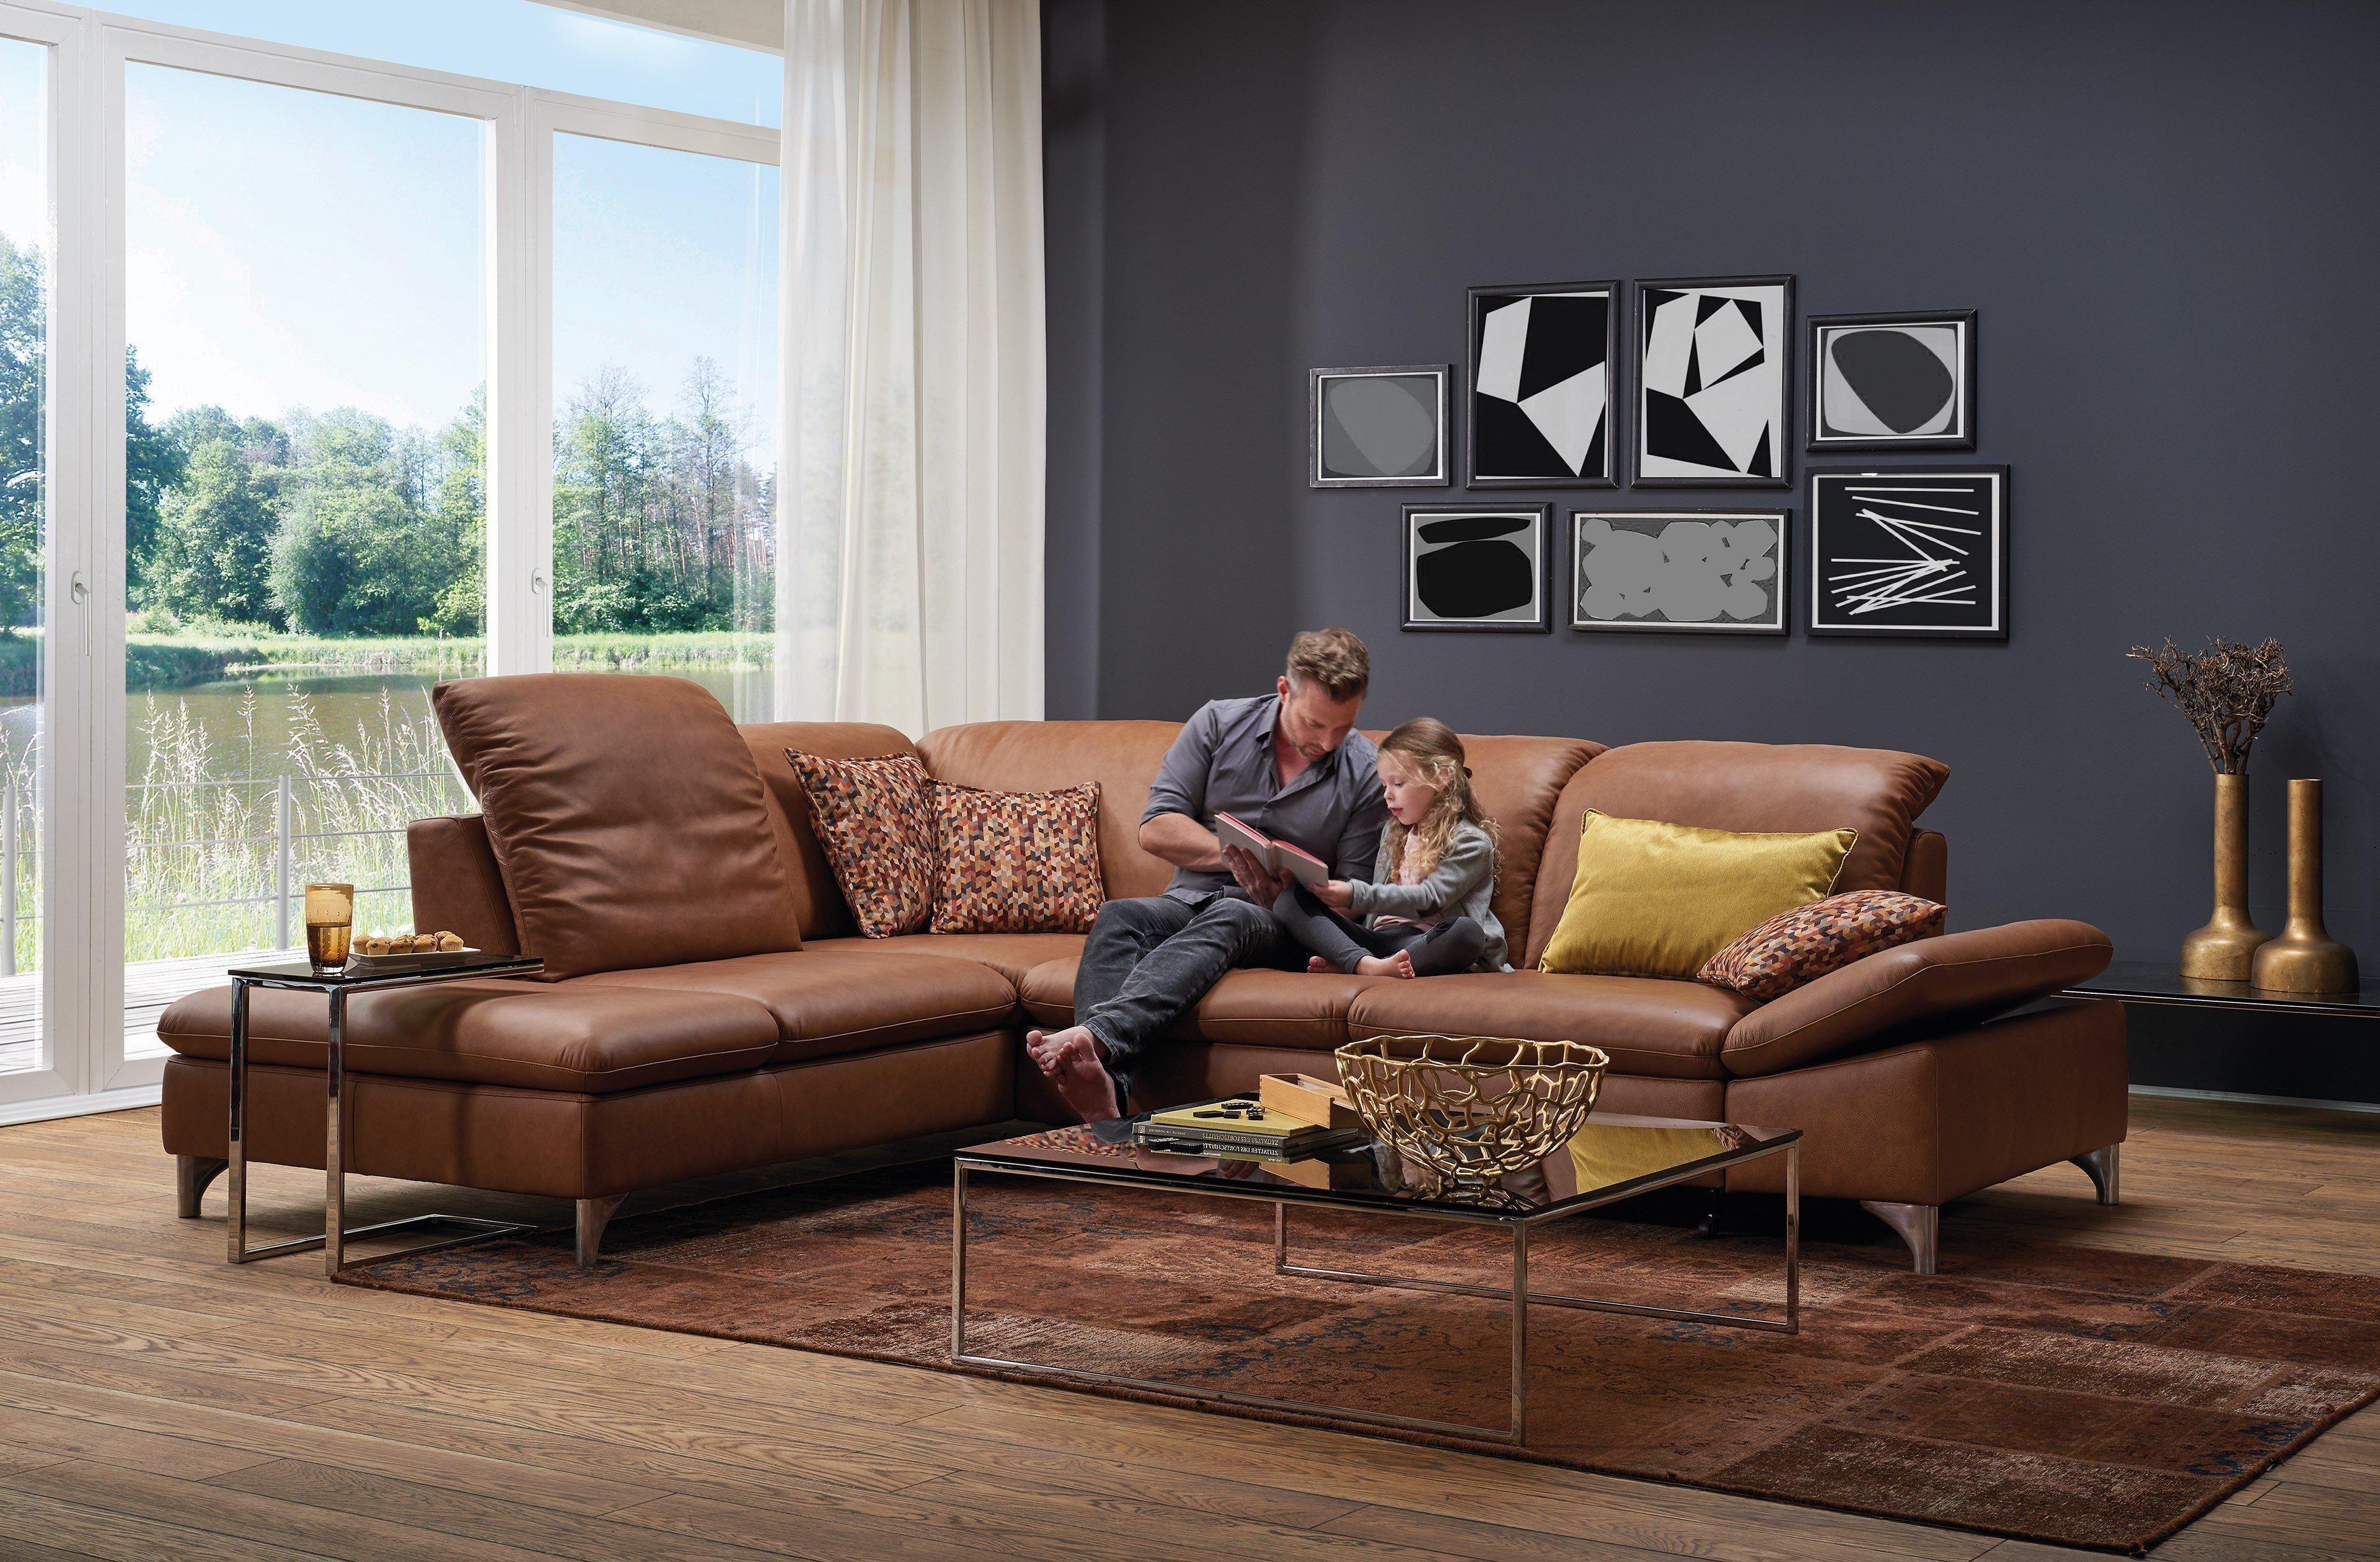 willi schillig 15270 enjoy ledergarnitur in braun m bel letz ihr online shop. Black Bedroom Furniture Sets. Home Design Ideas